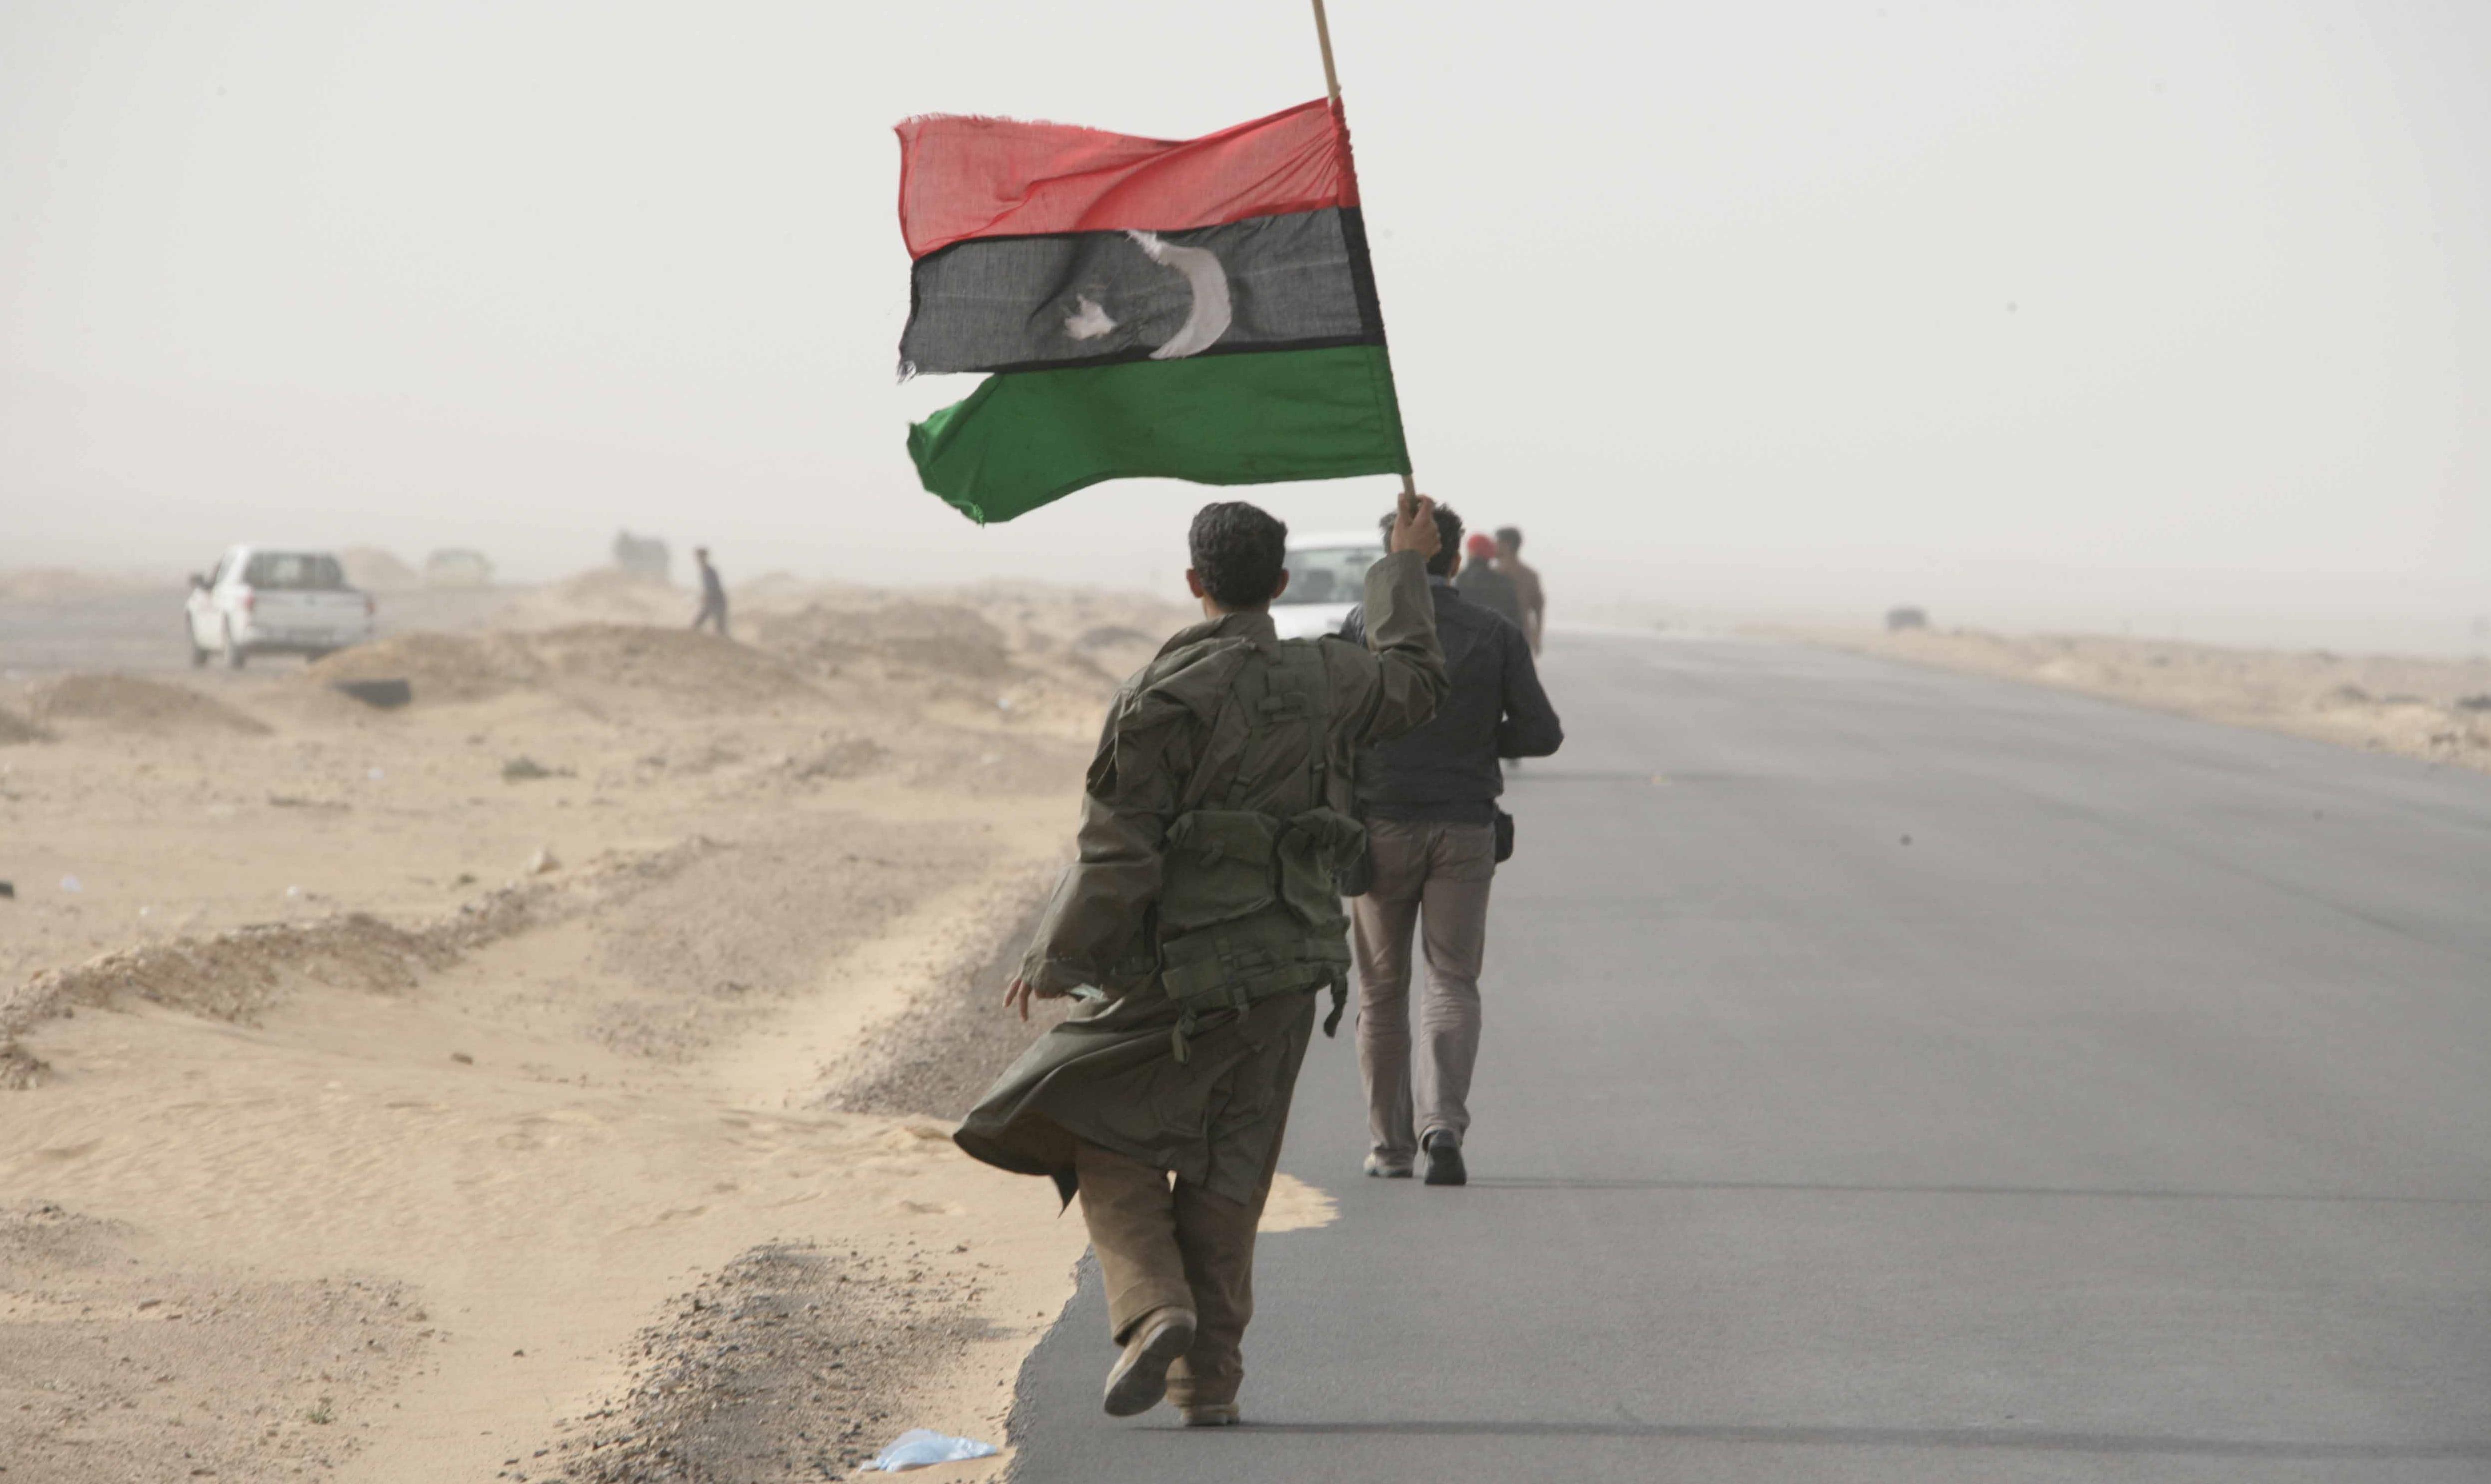 security us intervention in iraq essay